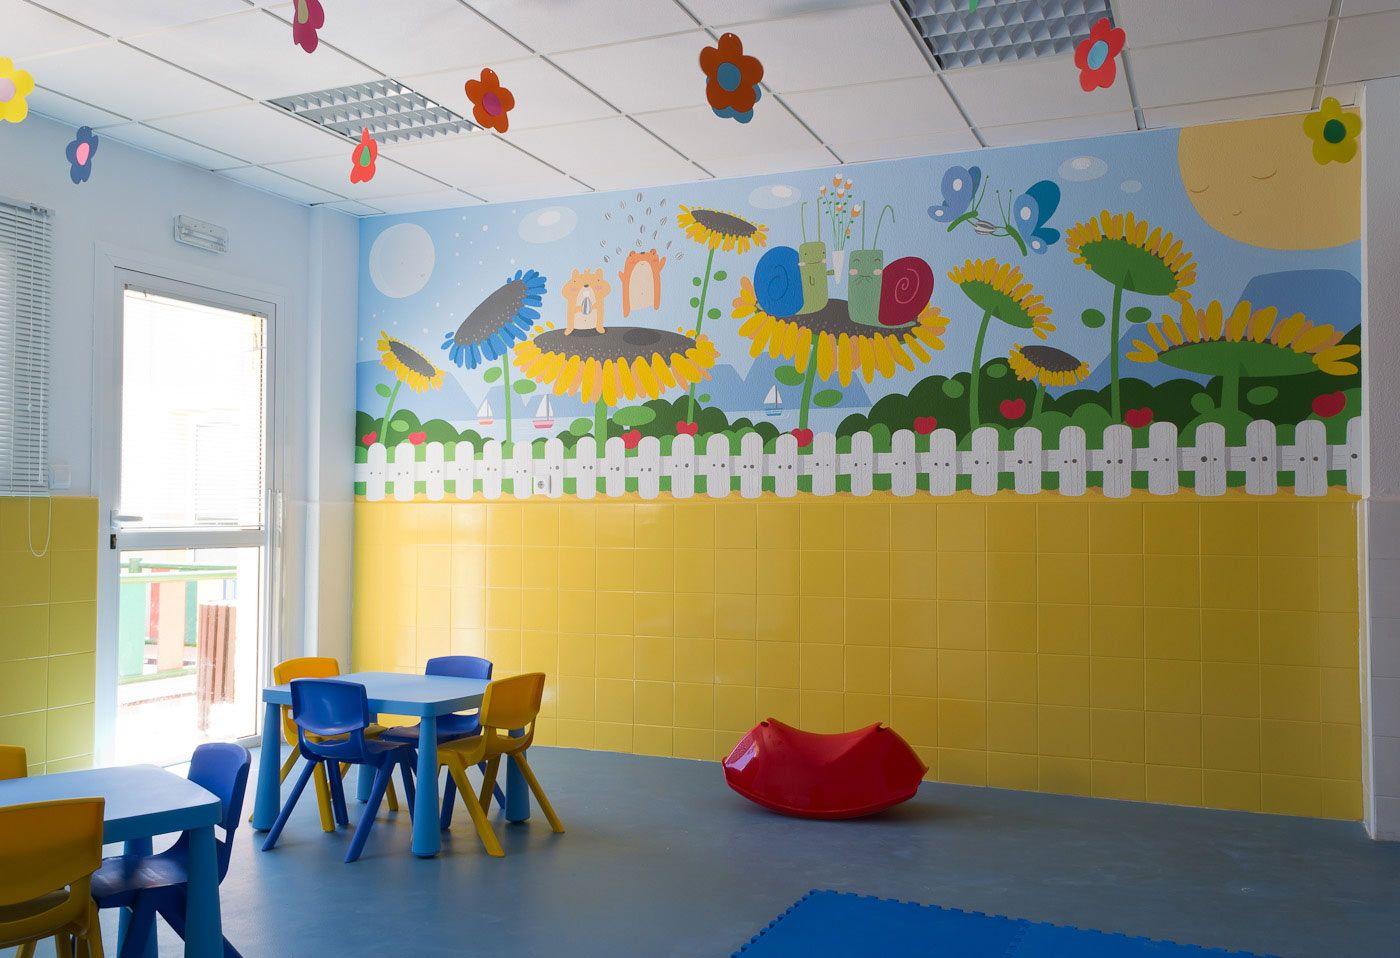 decoracion estancias infantiles - Buscar con Google | daycare ...